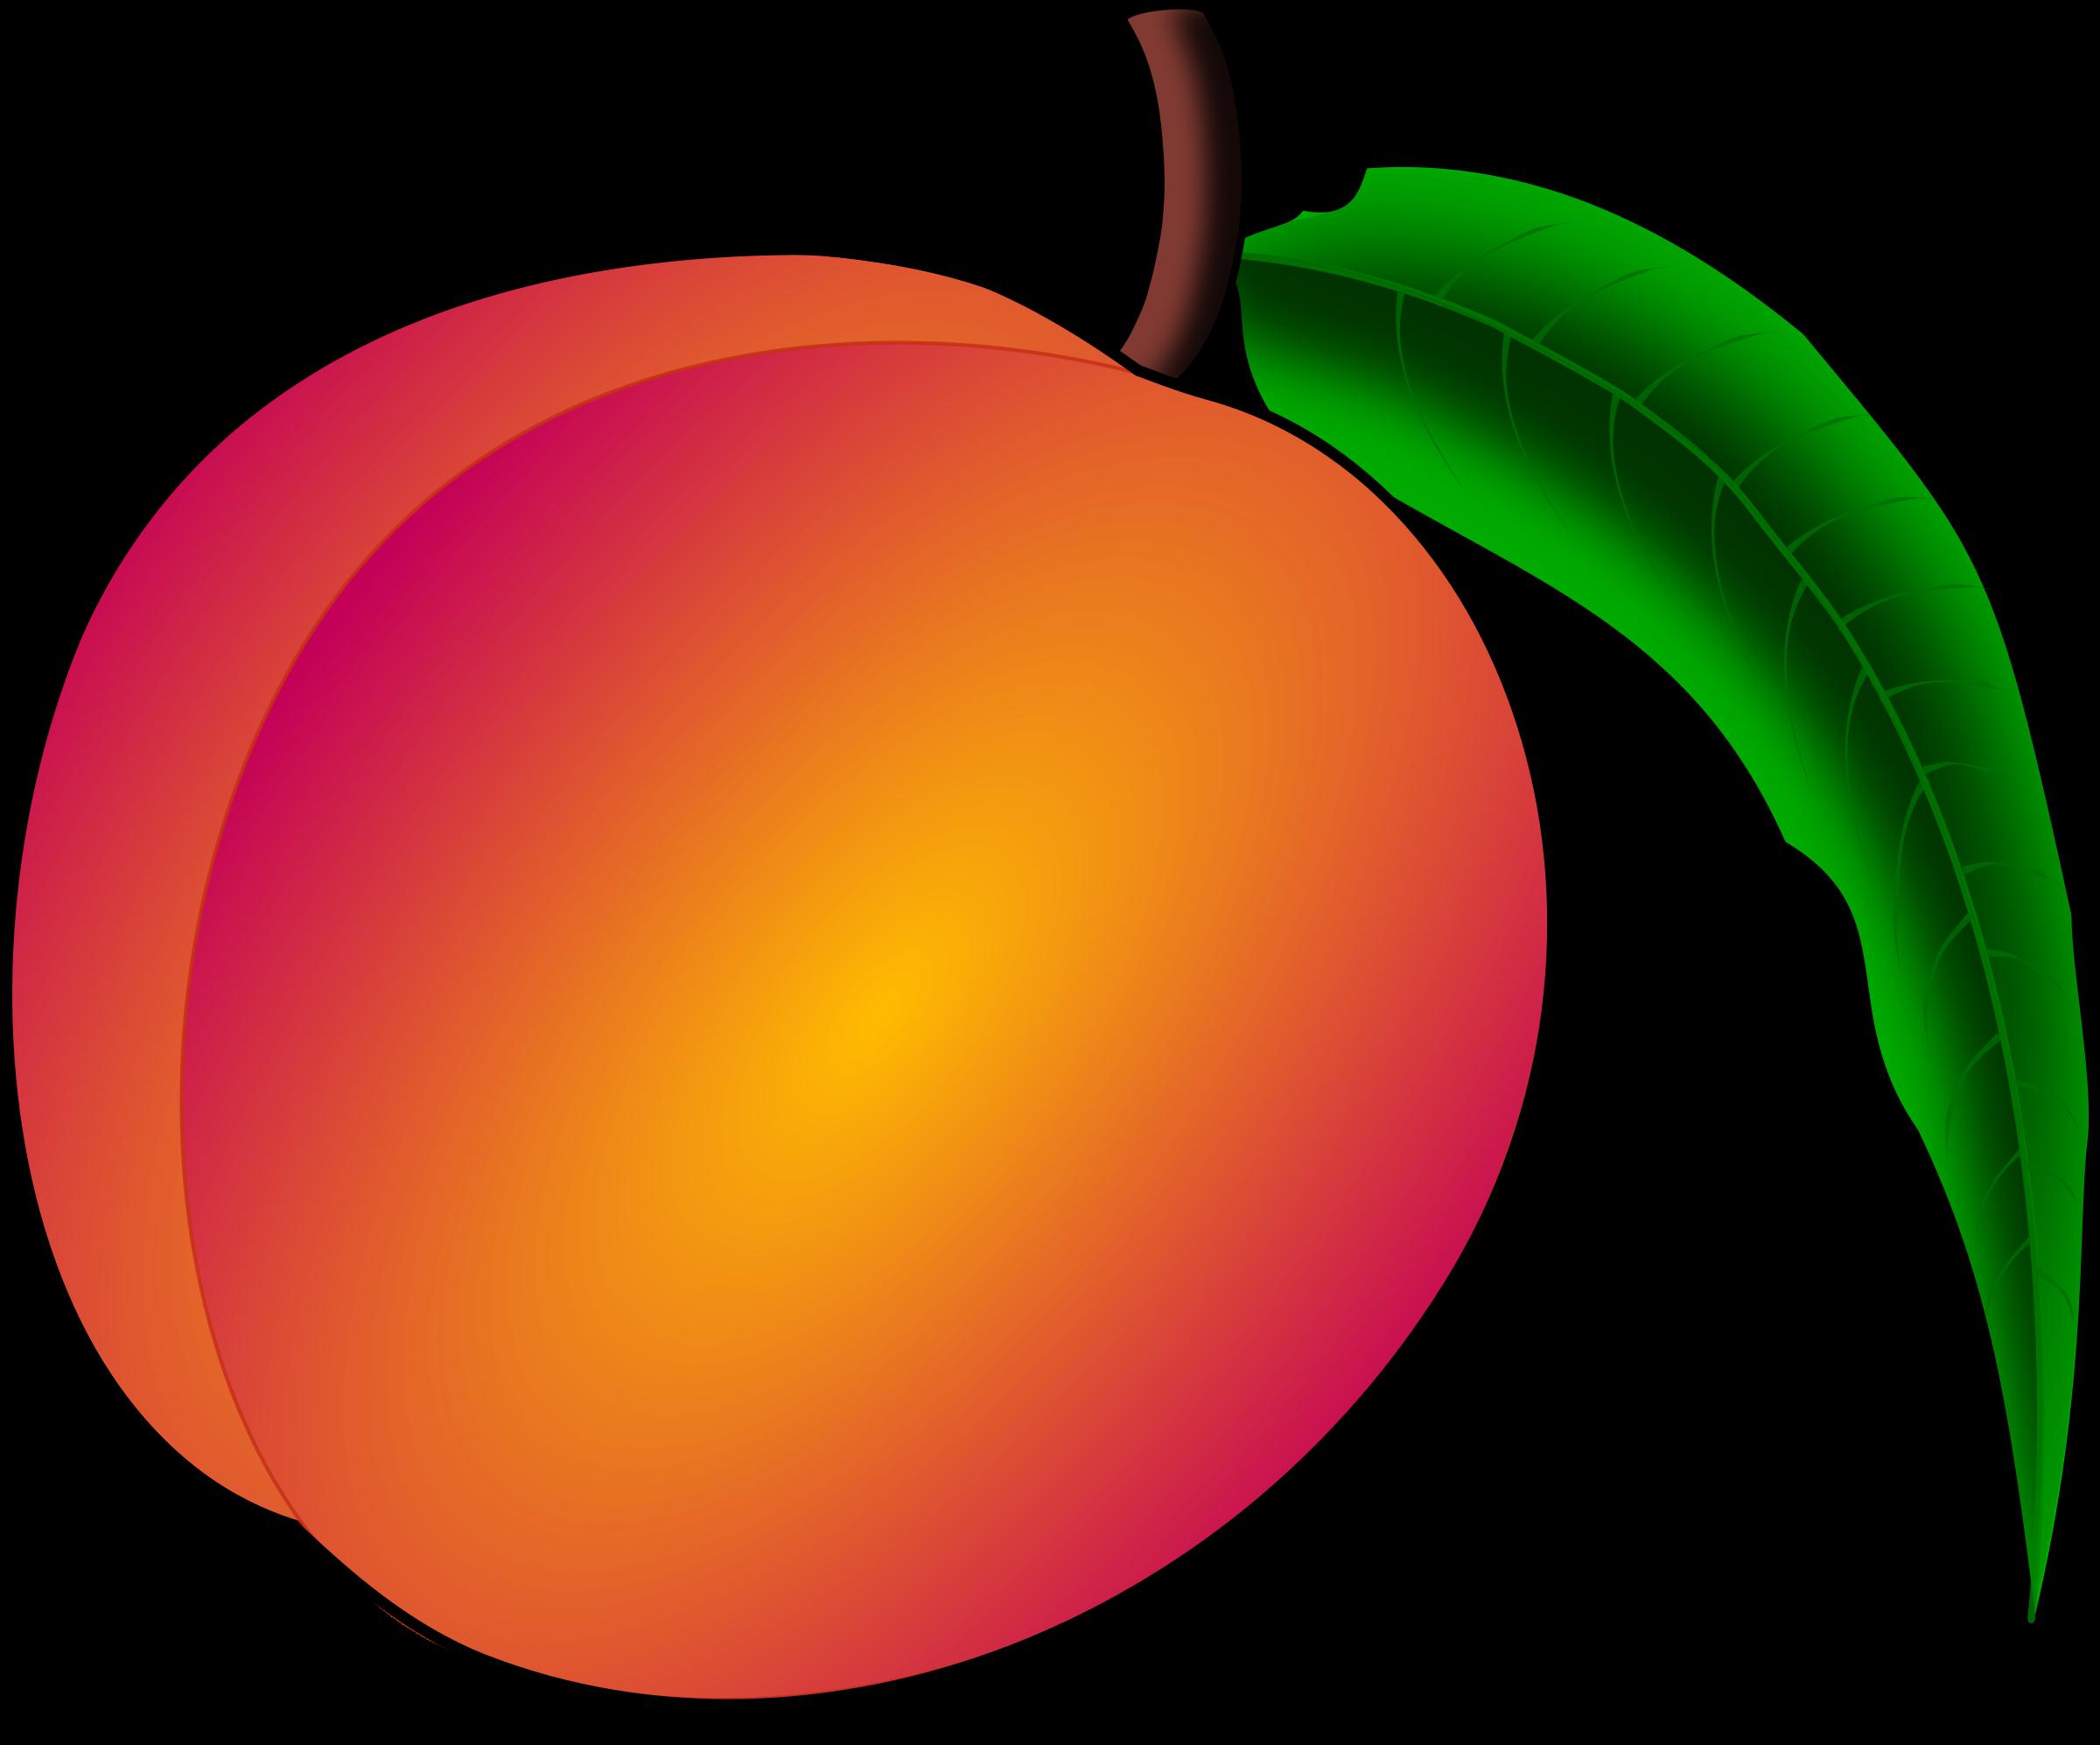 Peach clip art free clipart images